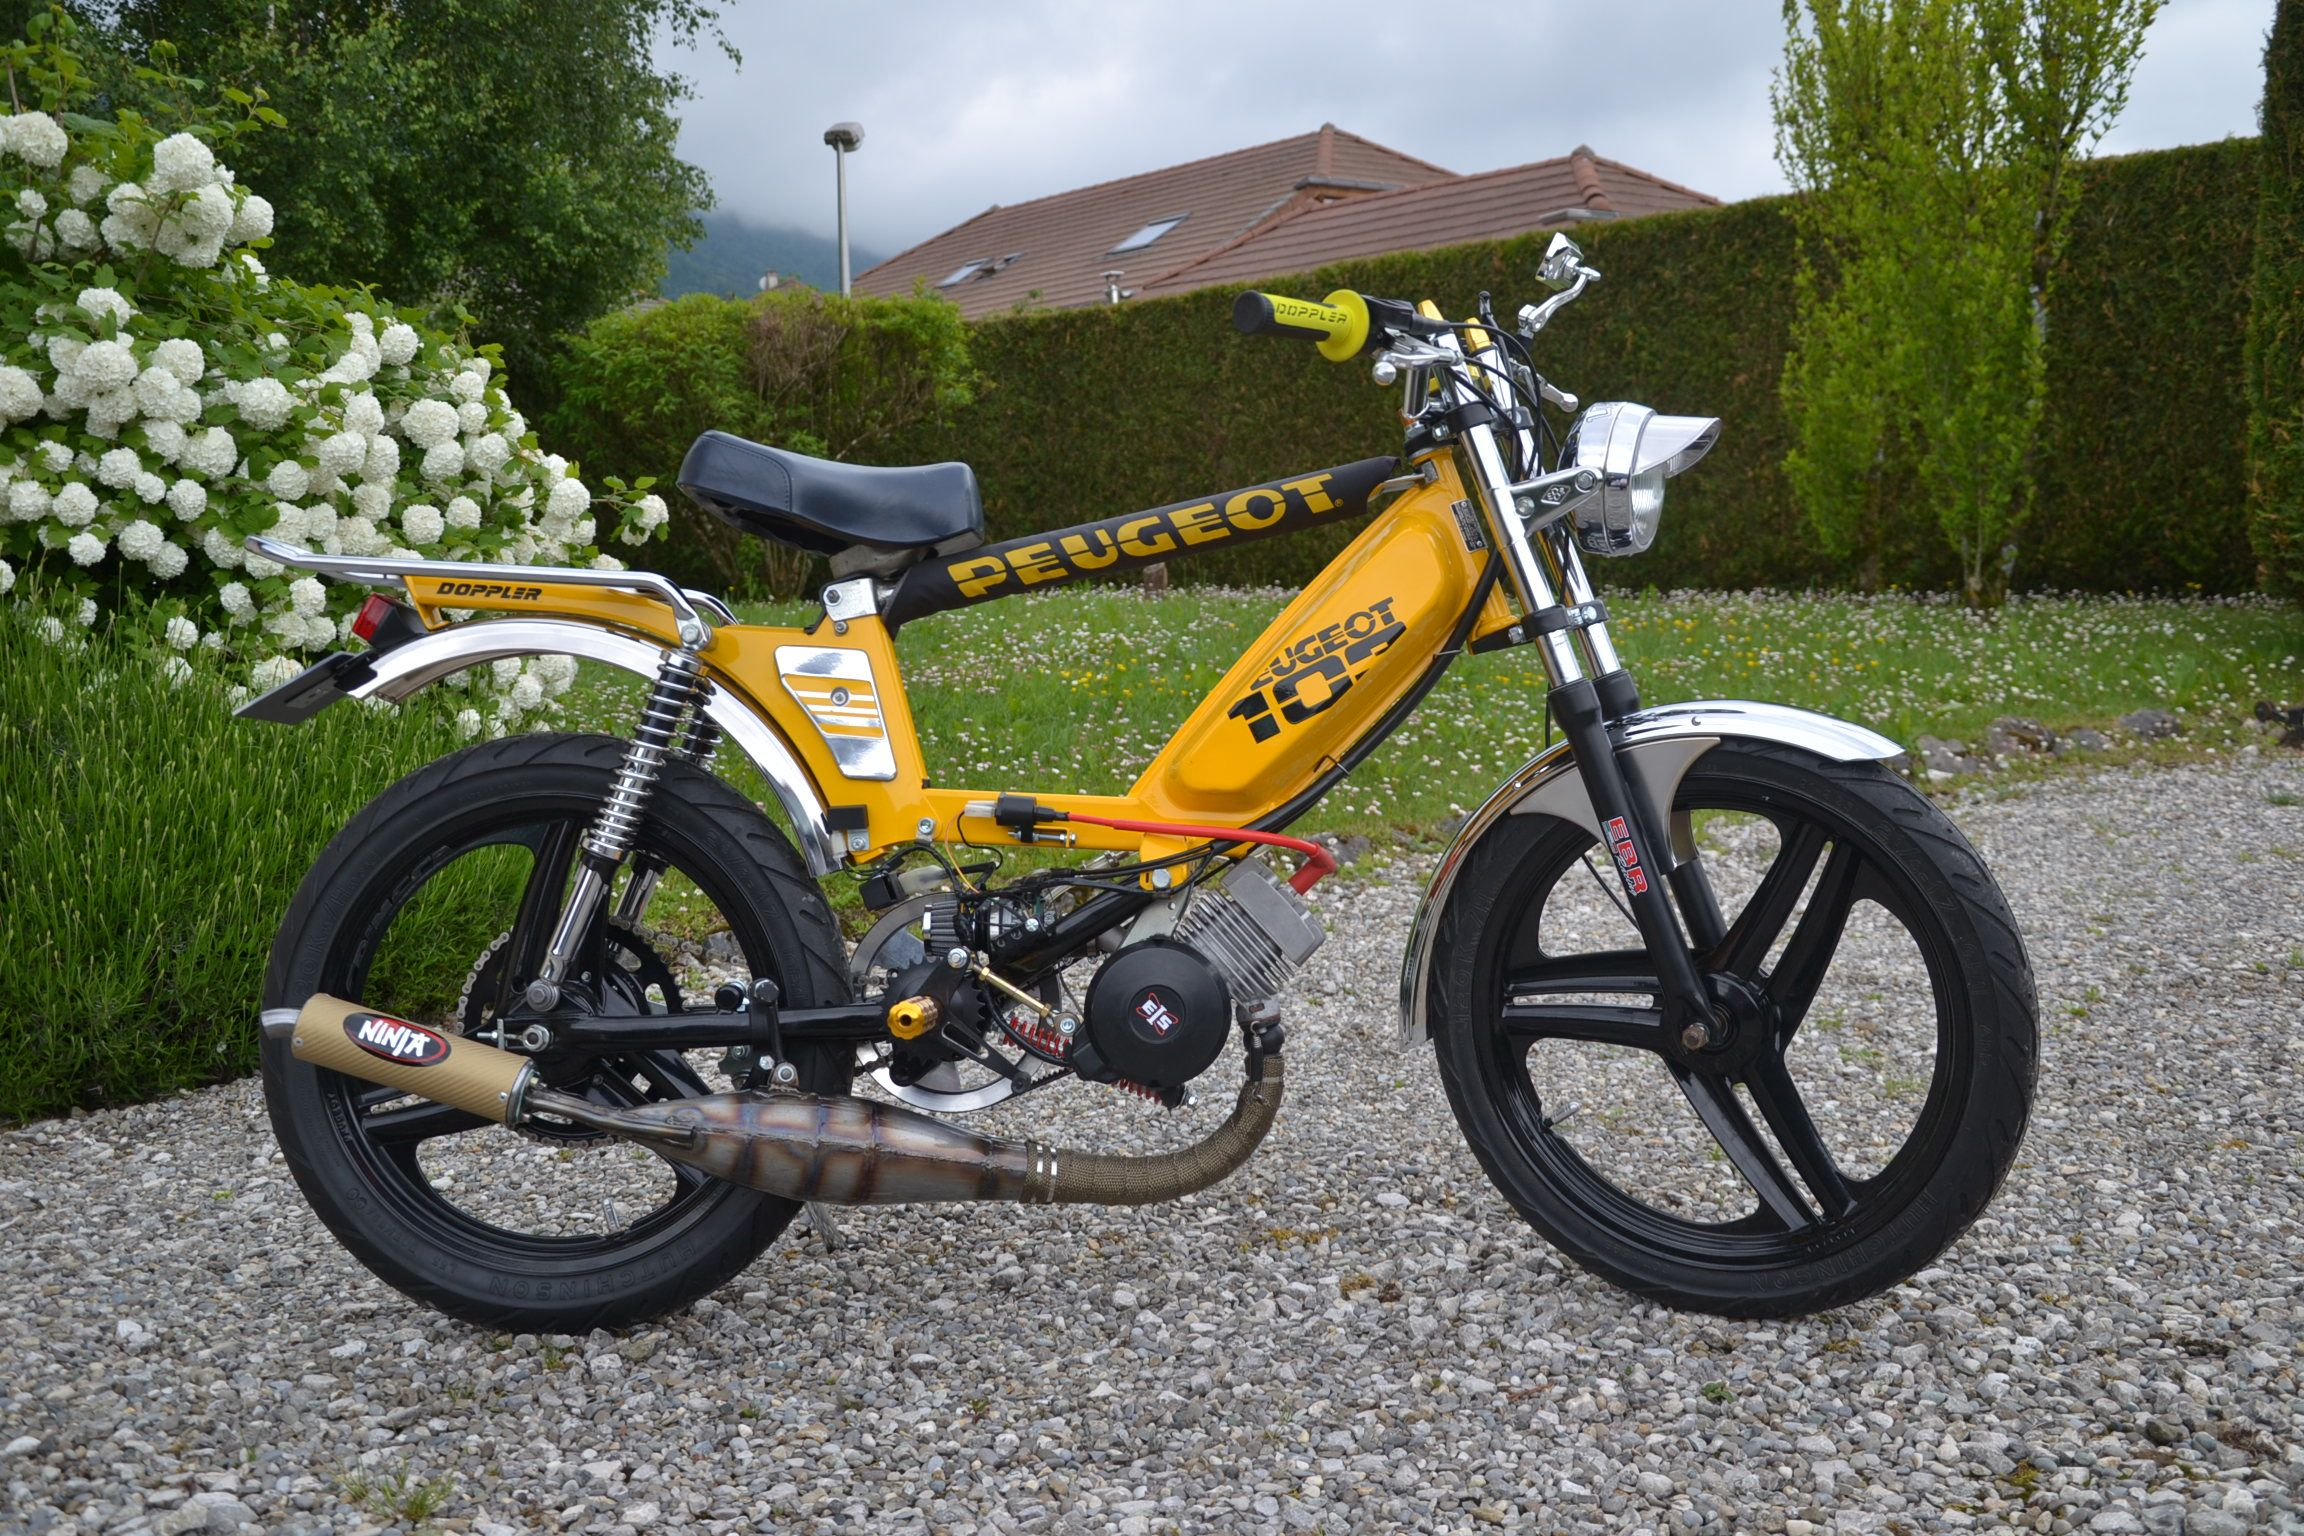 moped peugeot 103 mobylette doppler ninja polini mopedarmy mobylette pinterest. Black Bedroom Furniture Sets. Home Design Ideas